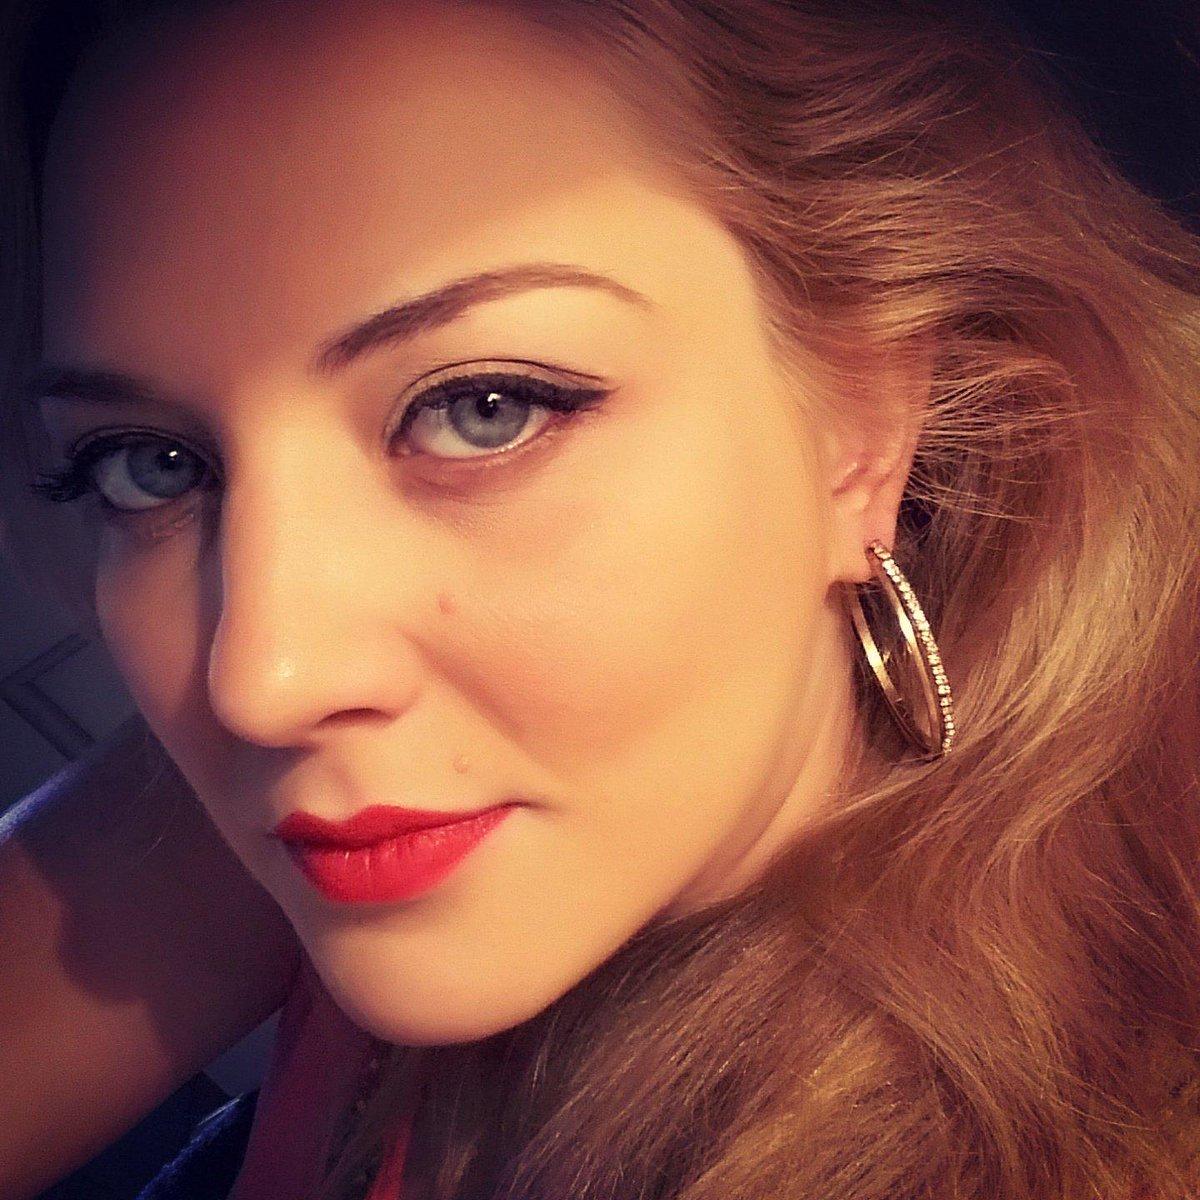 Mariângela Zan ~ Mariangela Zan (@mariangelazan) Twitter